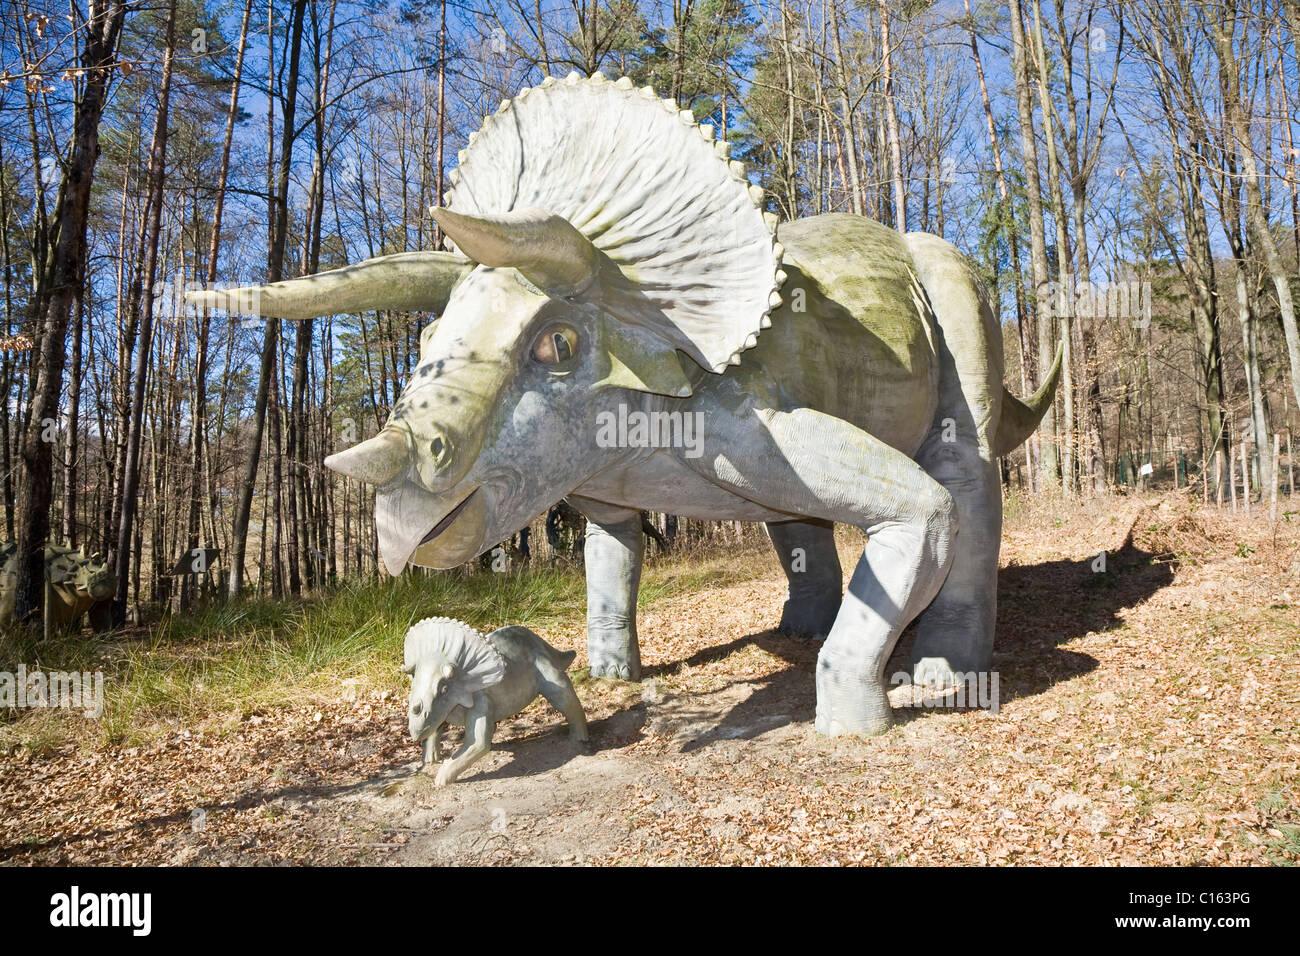 Triceratops Styrassic park Bad Gleichenberg Styria Austria Europe - Stock Image